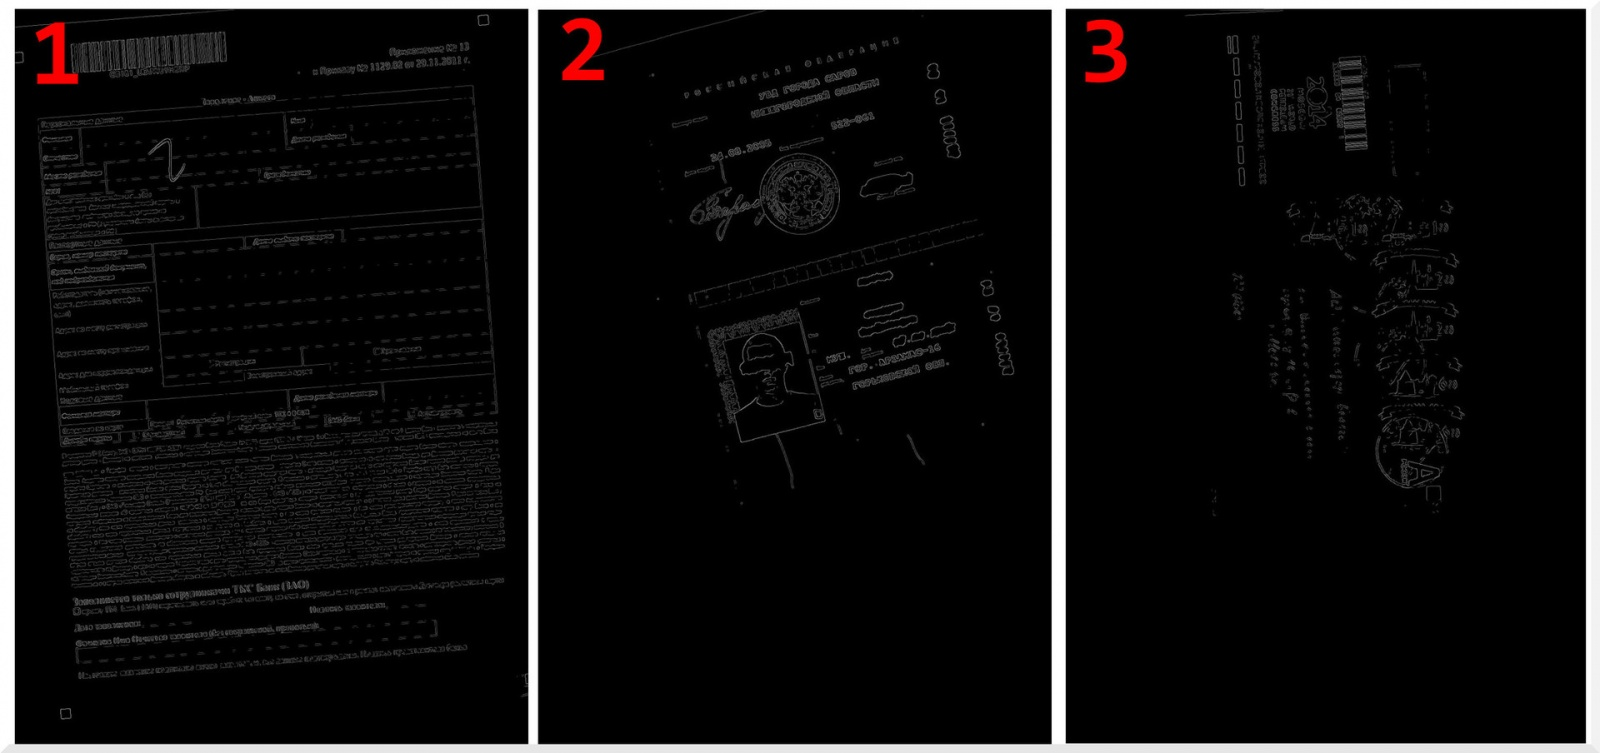 [ScanDoc] предобработка сканов - 3